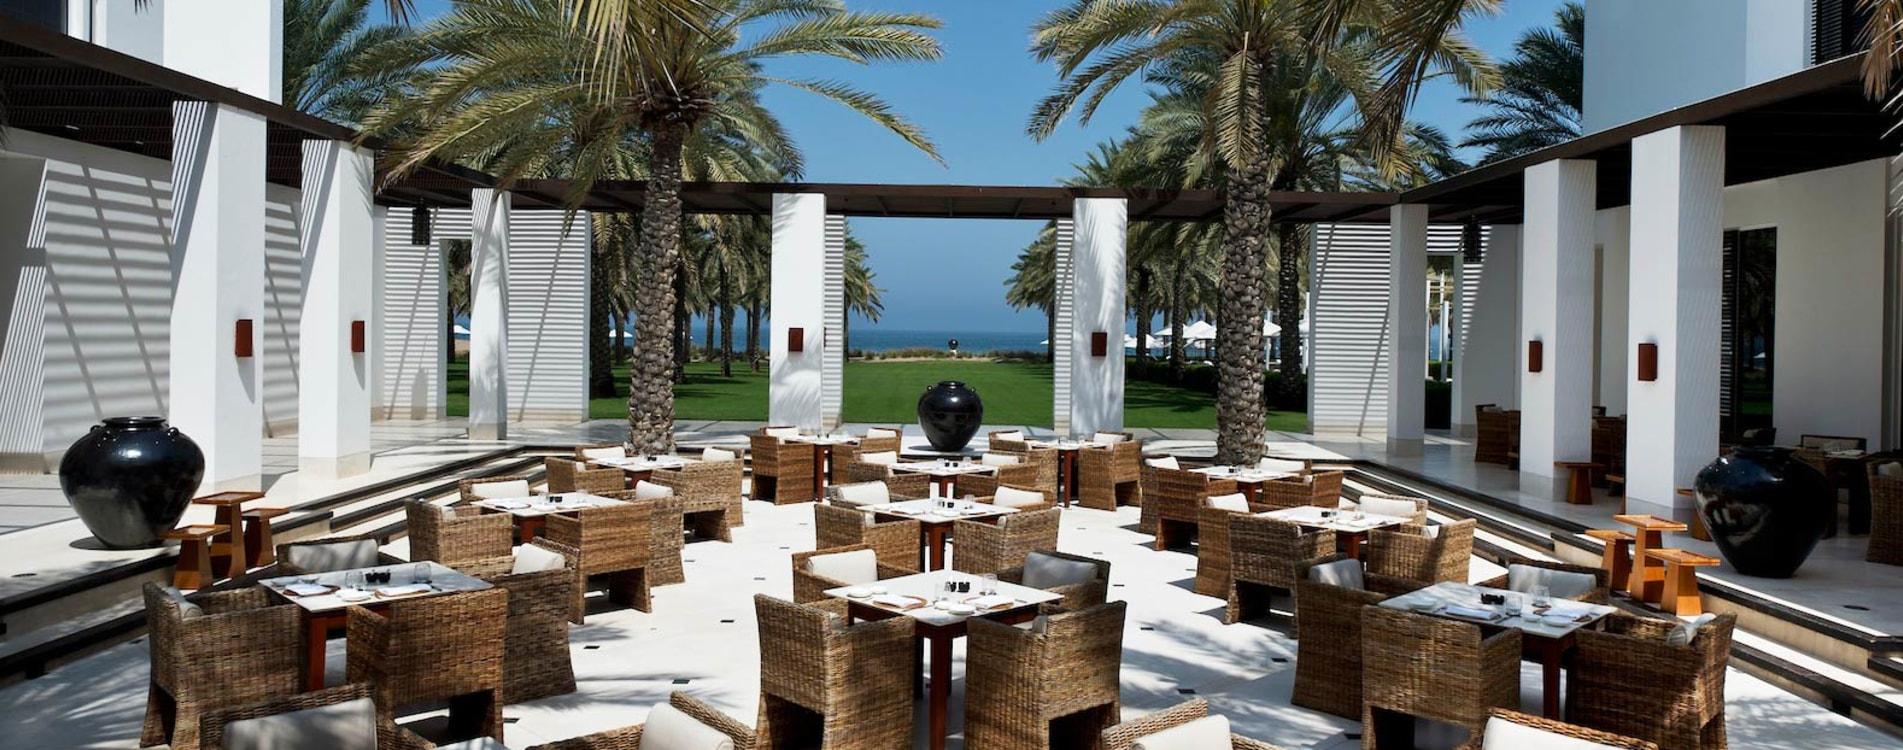 Chedi-Muscat-Restaurant-Courtyard-Daytime.jpg